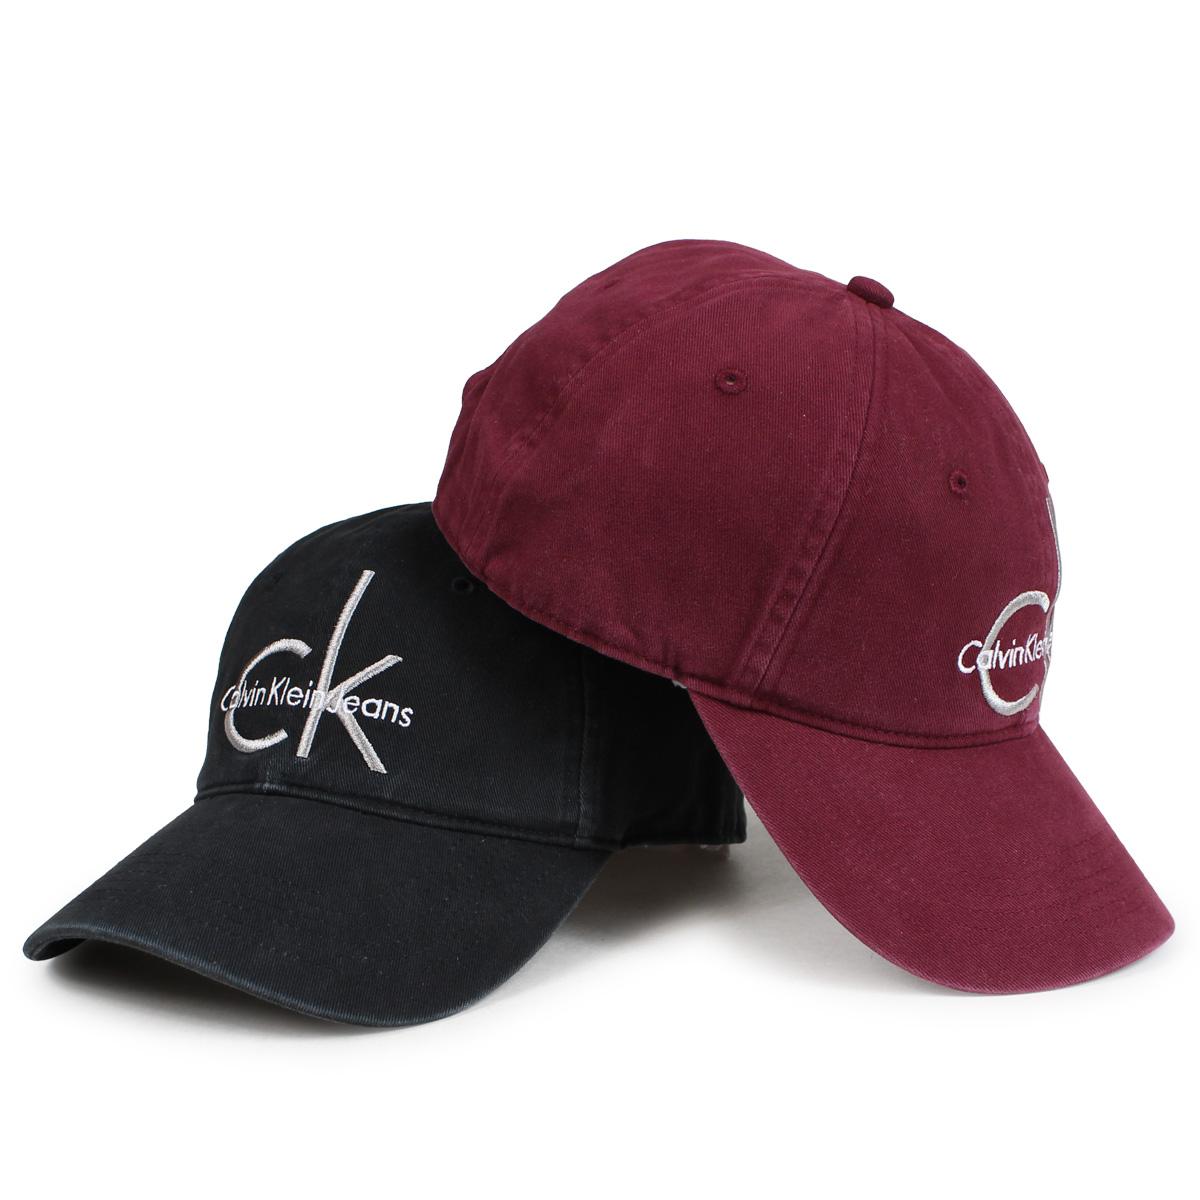 ALLSPORTS  Calvin Klein Jeans BASEBALL DAD CAP Calvin Klein jeans cap hat  men gap Dis black burgundy 4500  12 20 Shinnyu load   da7e9998217